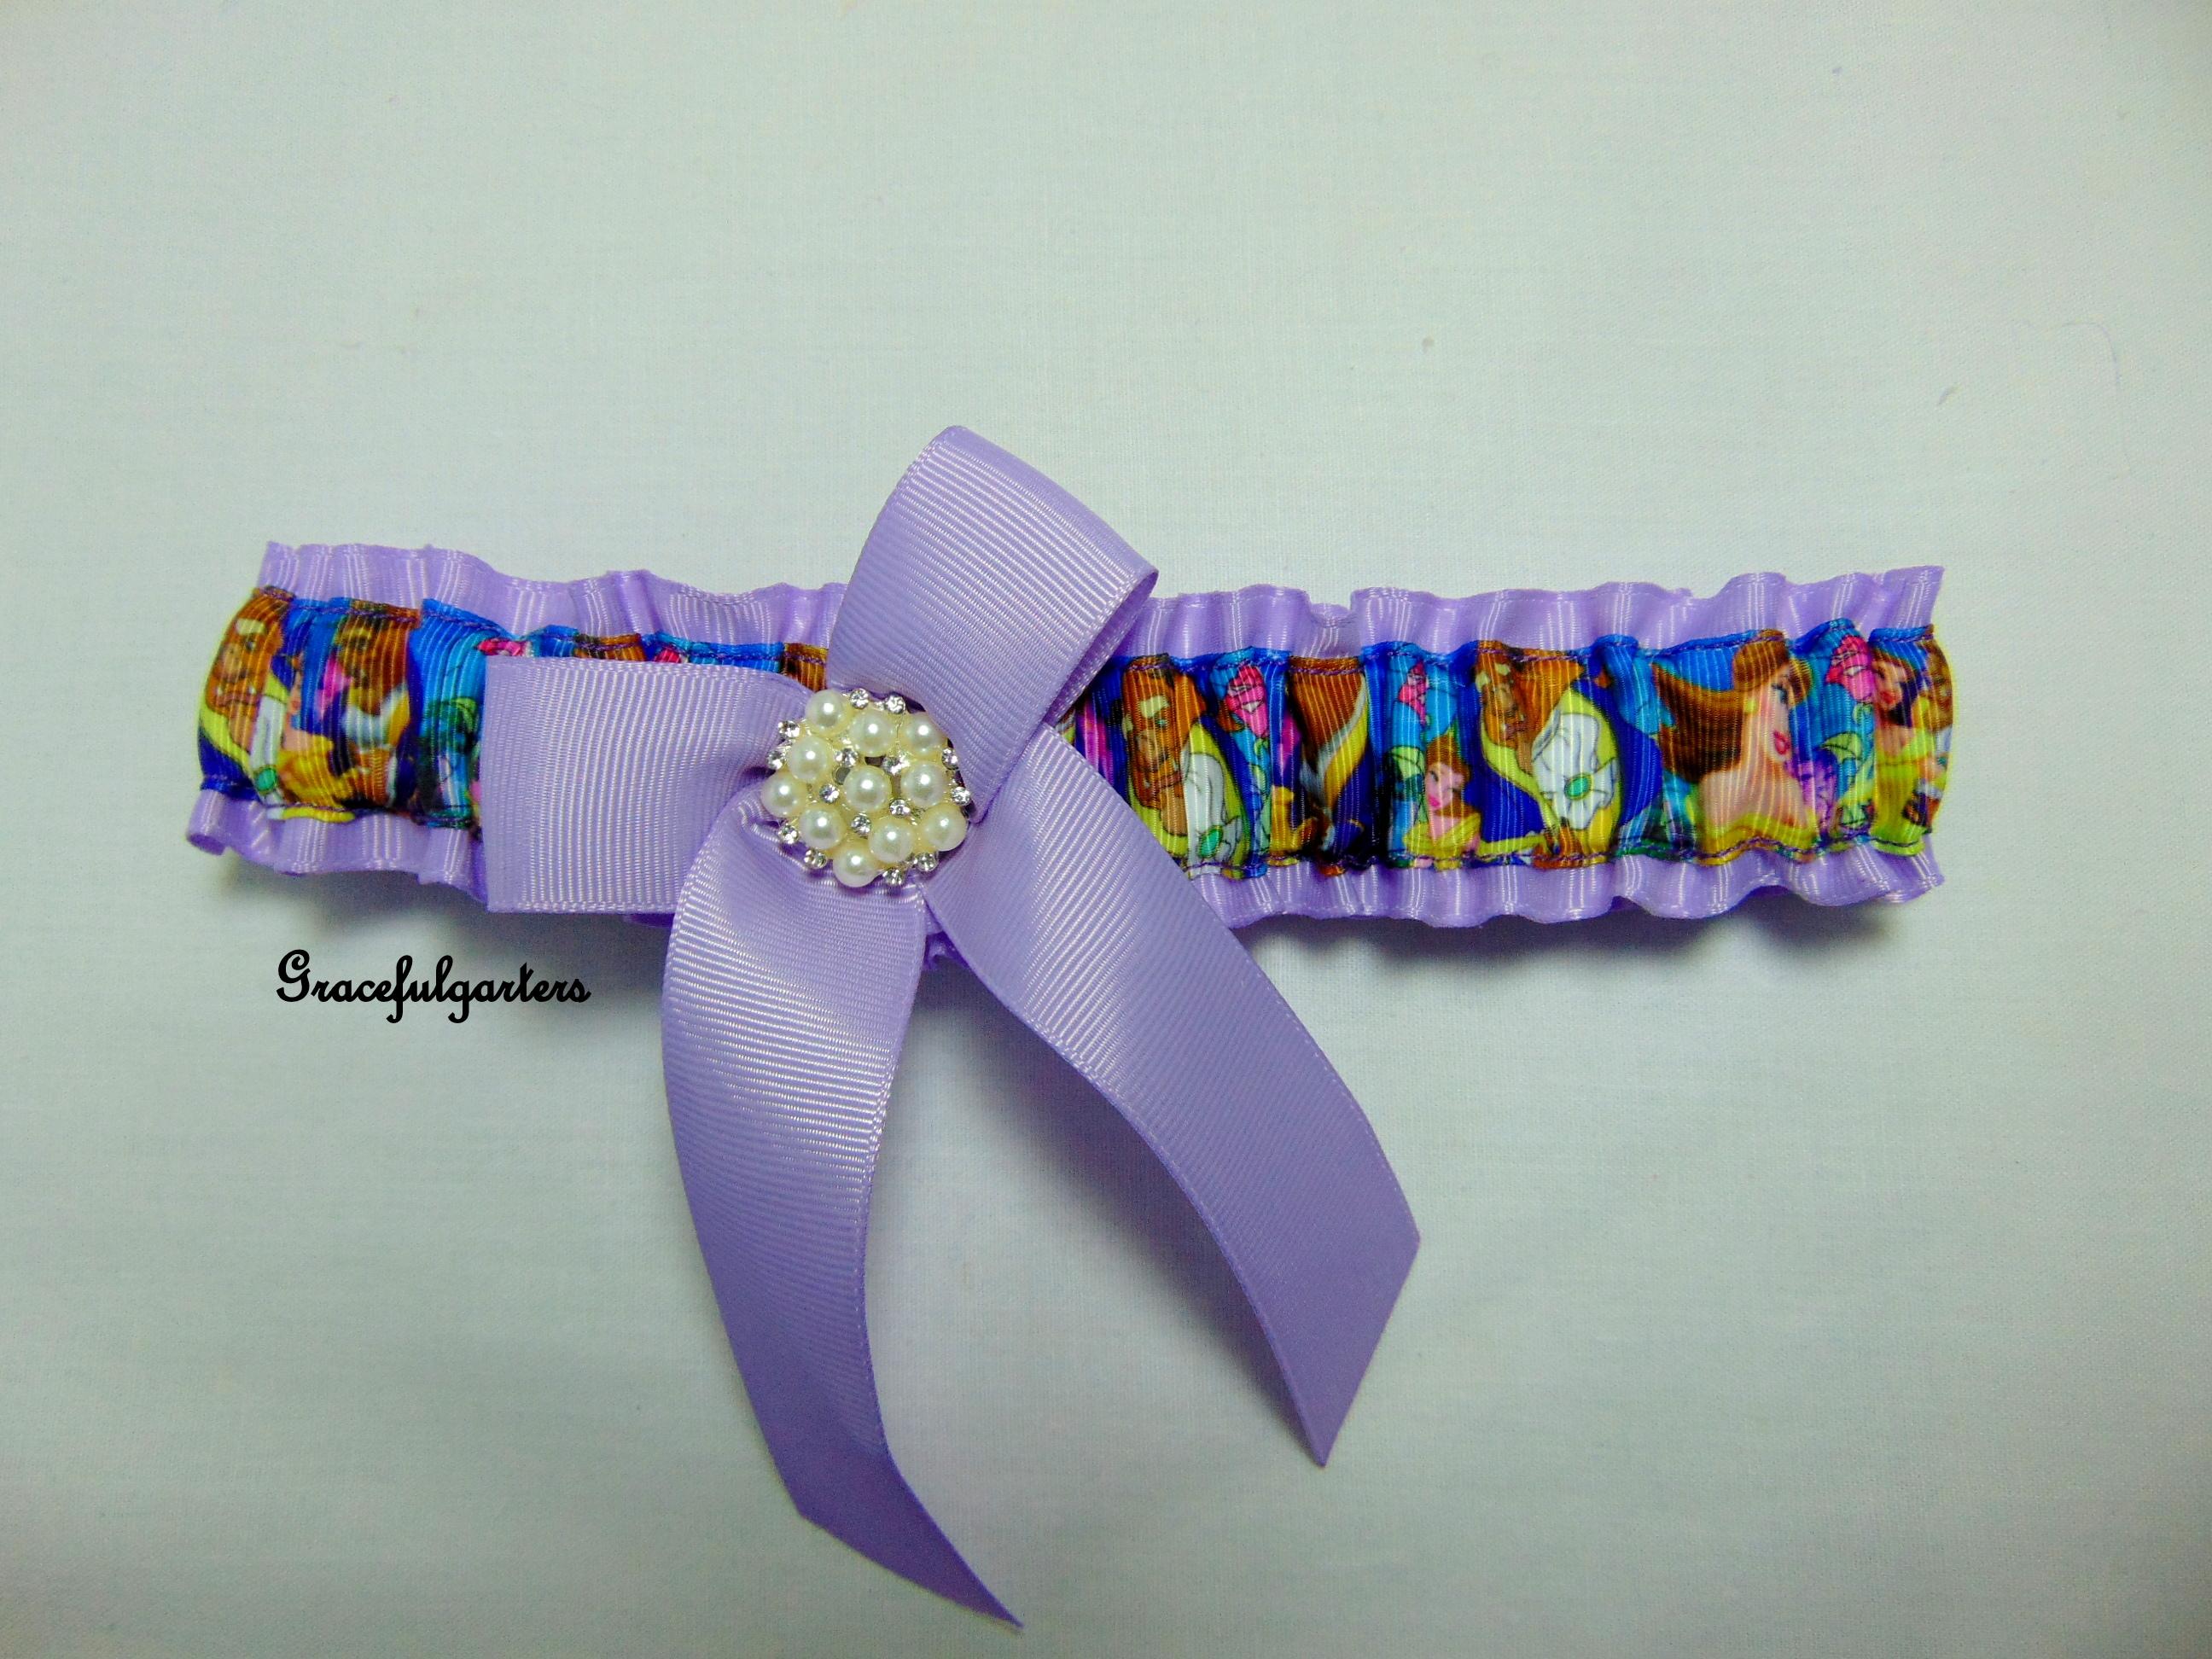 Beauty and the Beast Lilac Disney Bridal Wedding Garter